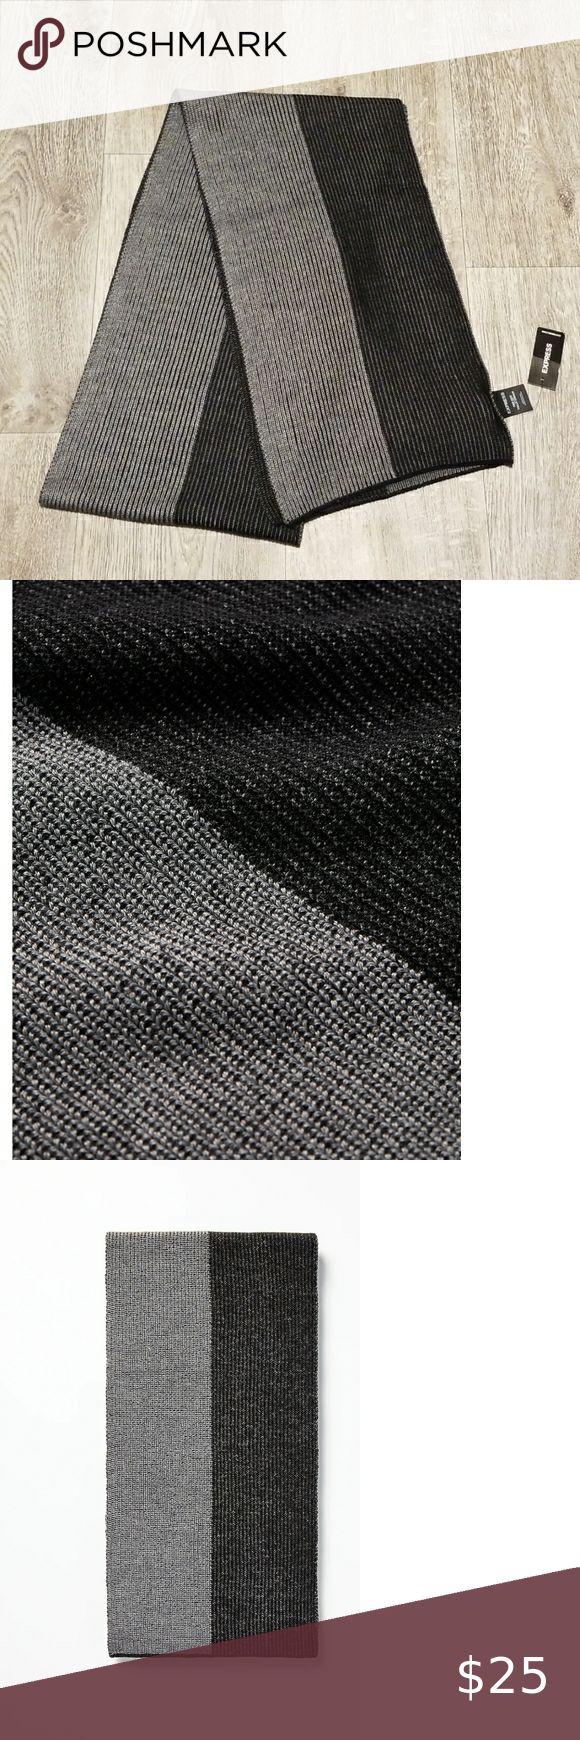 Merino Wool Express Blend Scarf Nwt In 2020 Merino Wool Wool Scarf Accessory